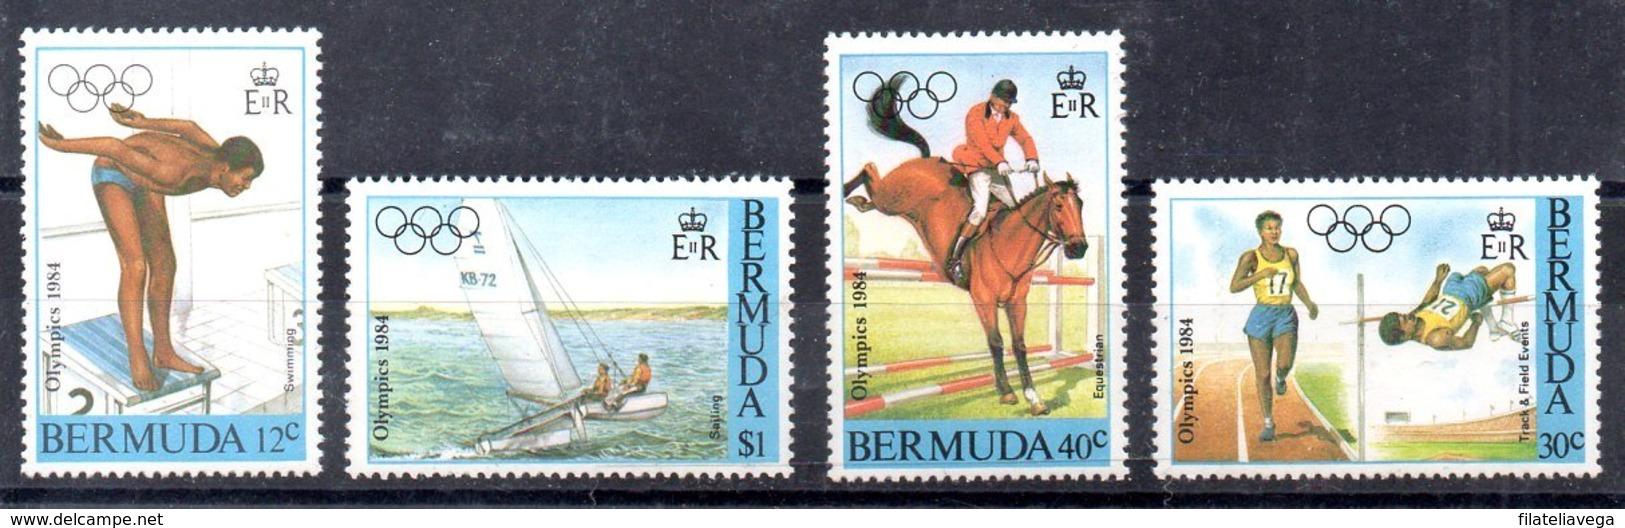 Bermudas Serie Completa Nº Yvert 443/46 ** Valor Catálogo 9.0€ - Bermudas